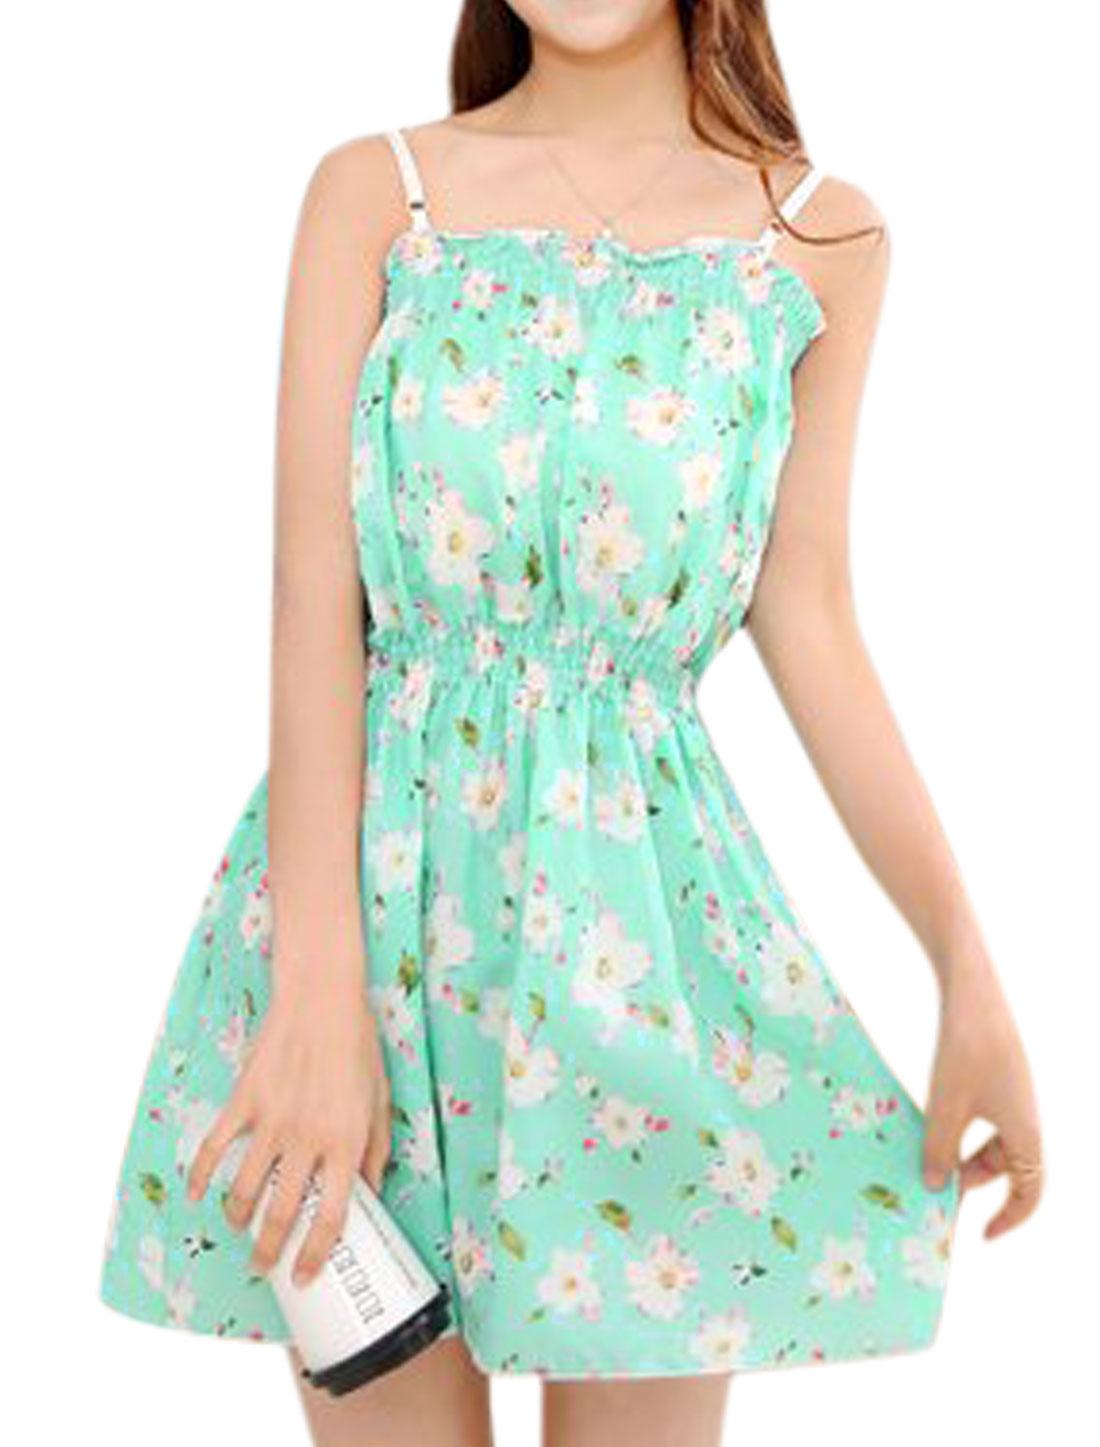 Women Flower Print Elastic Waist Spaghetti Strap Casual Unlined Dresses Mint XS